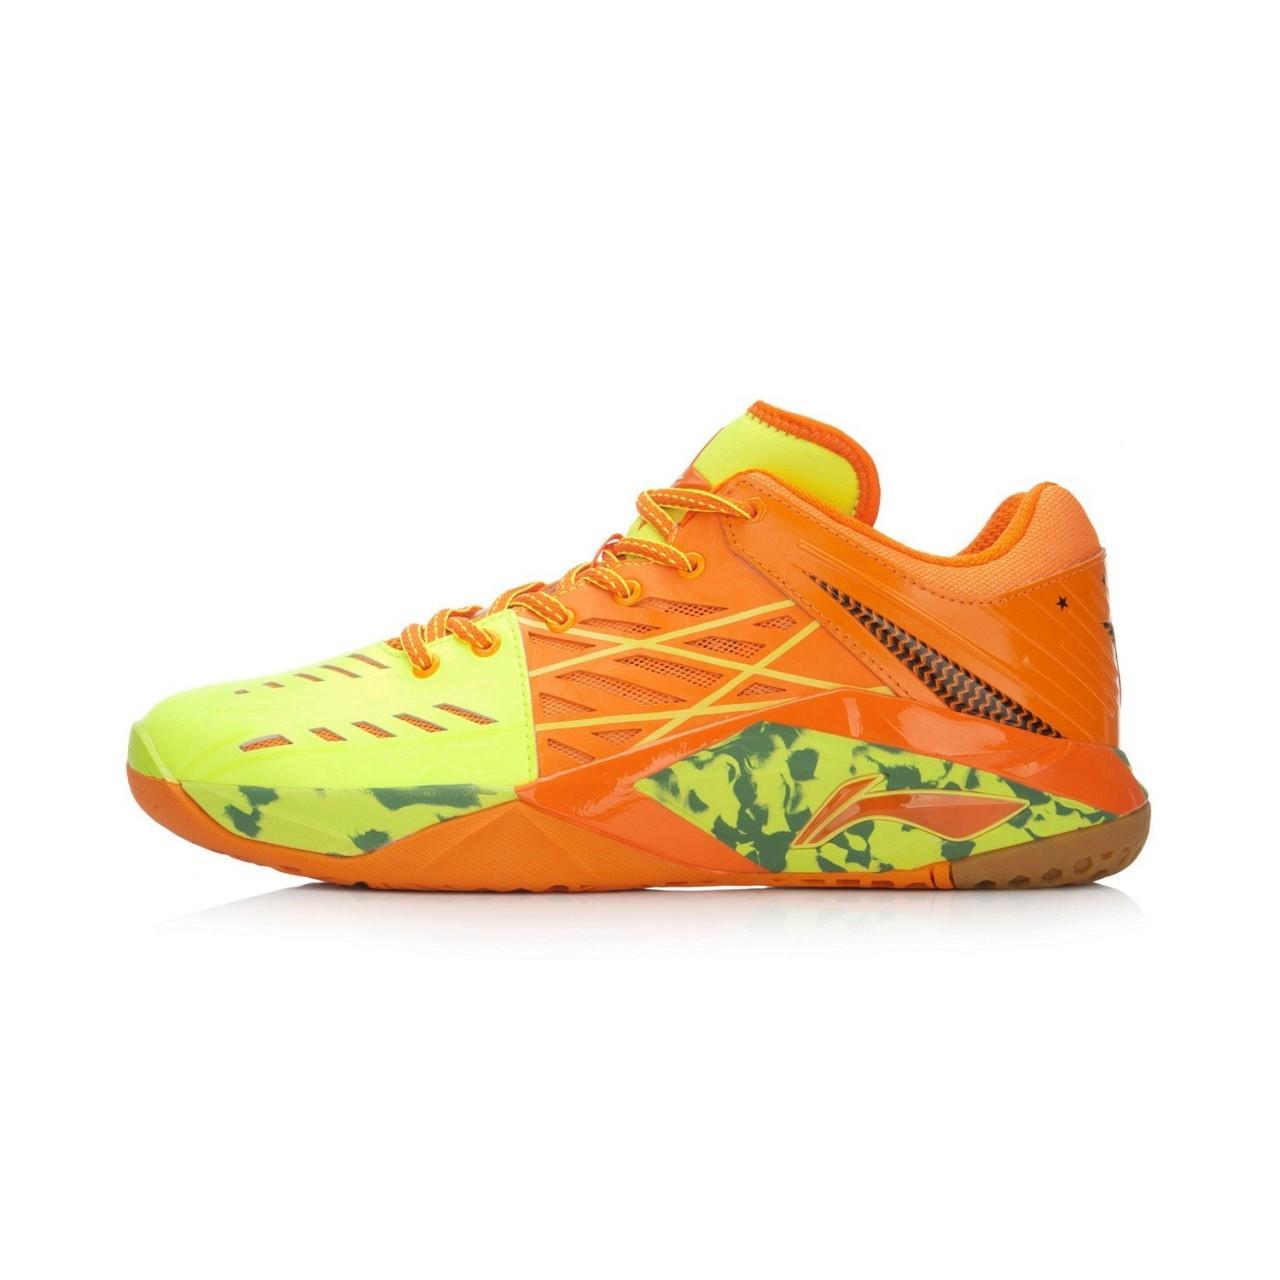 Li Ning Chen Long 2018 Summer Badminton Shoes